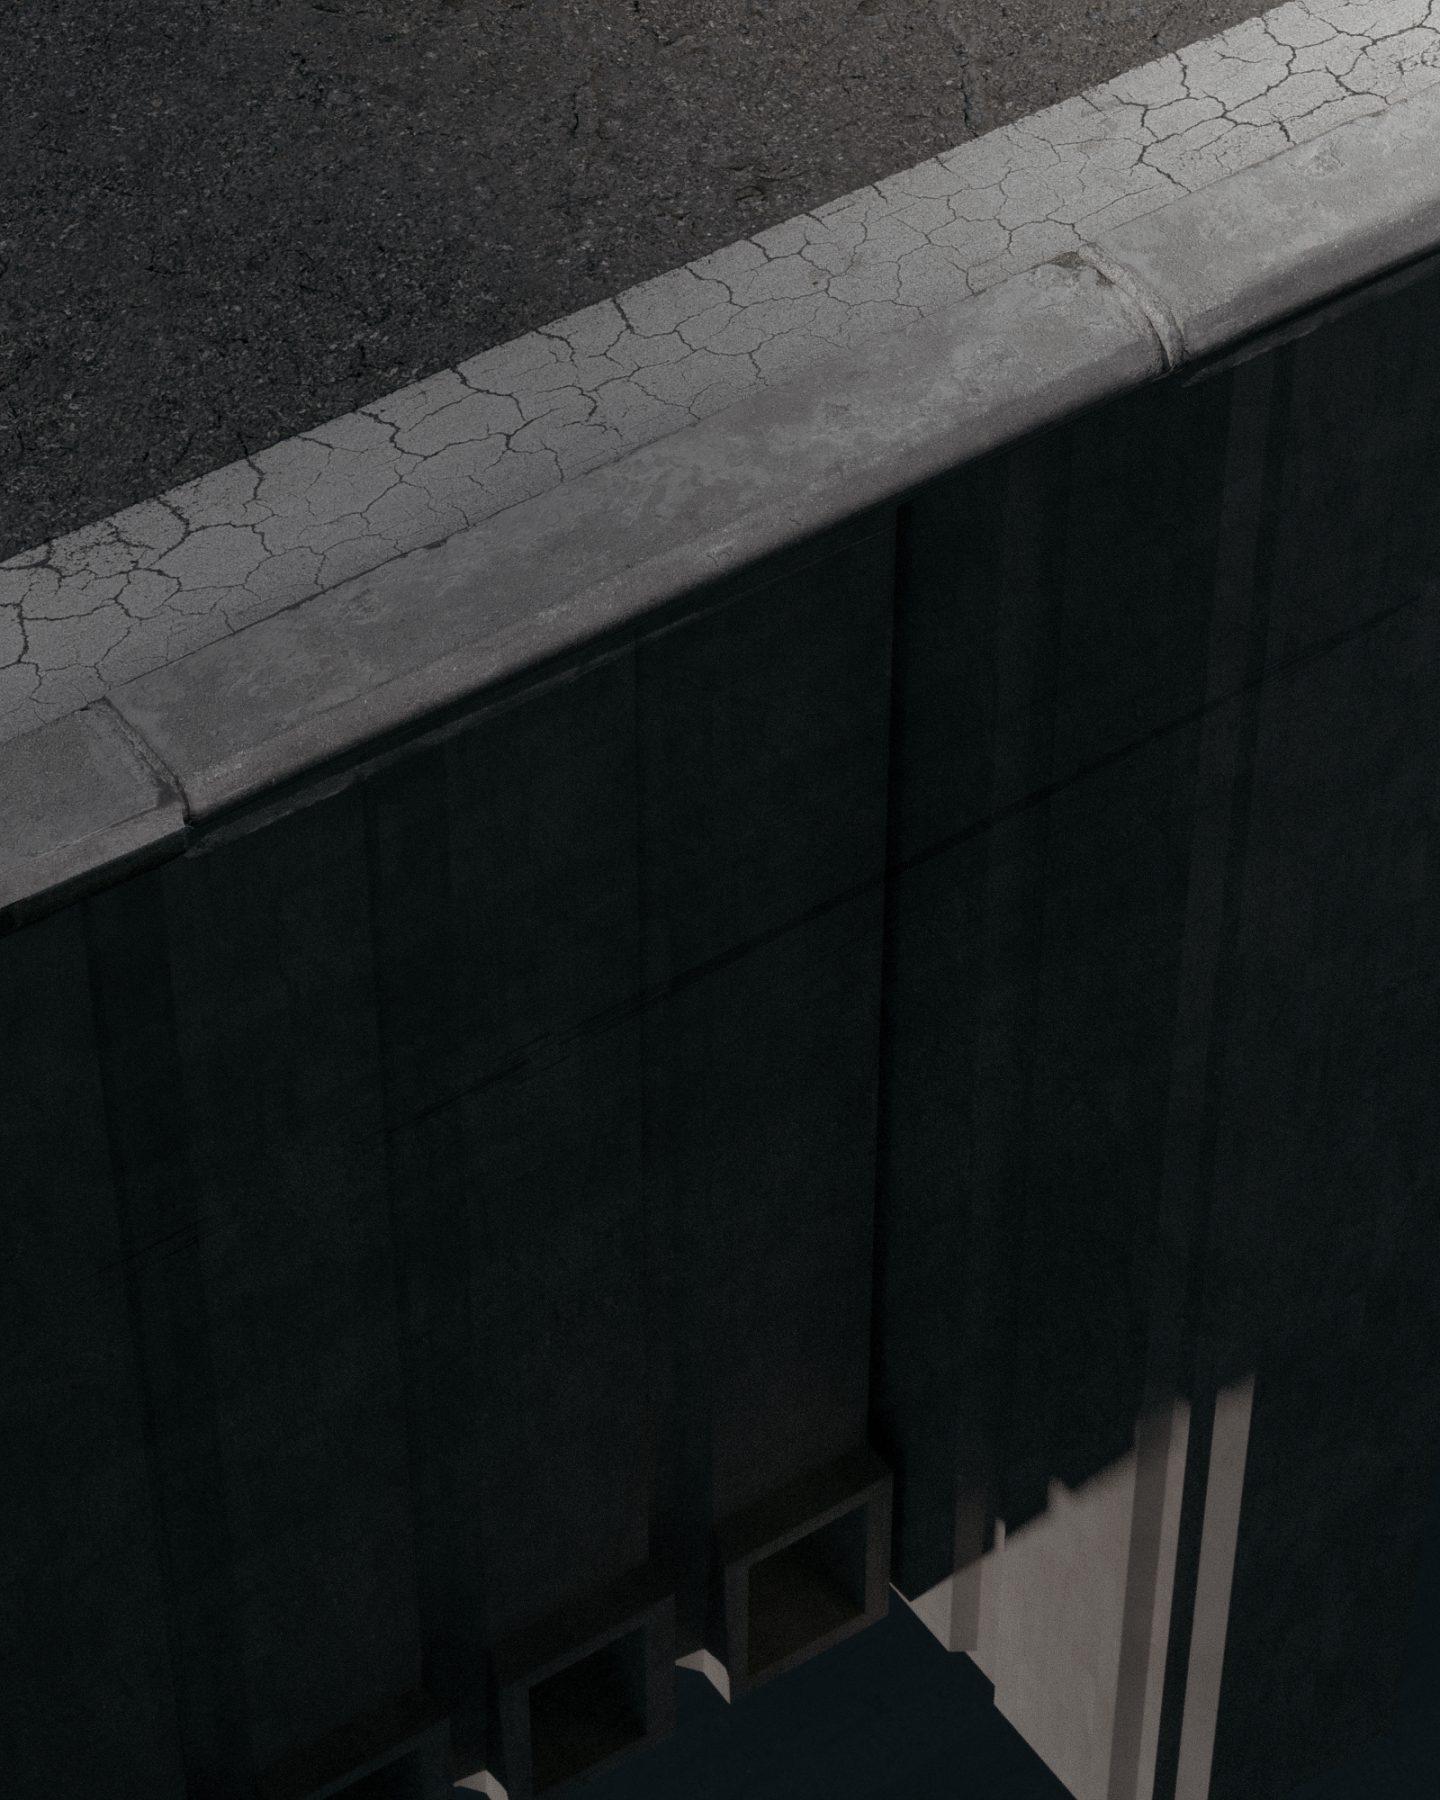 IGNANT-Tesla-cybertruck-cgi-brutalism-cgi-editorial-1